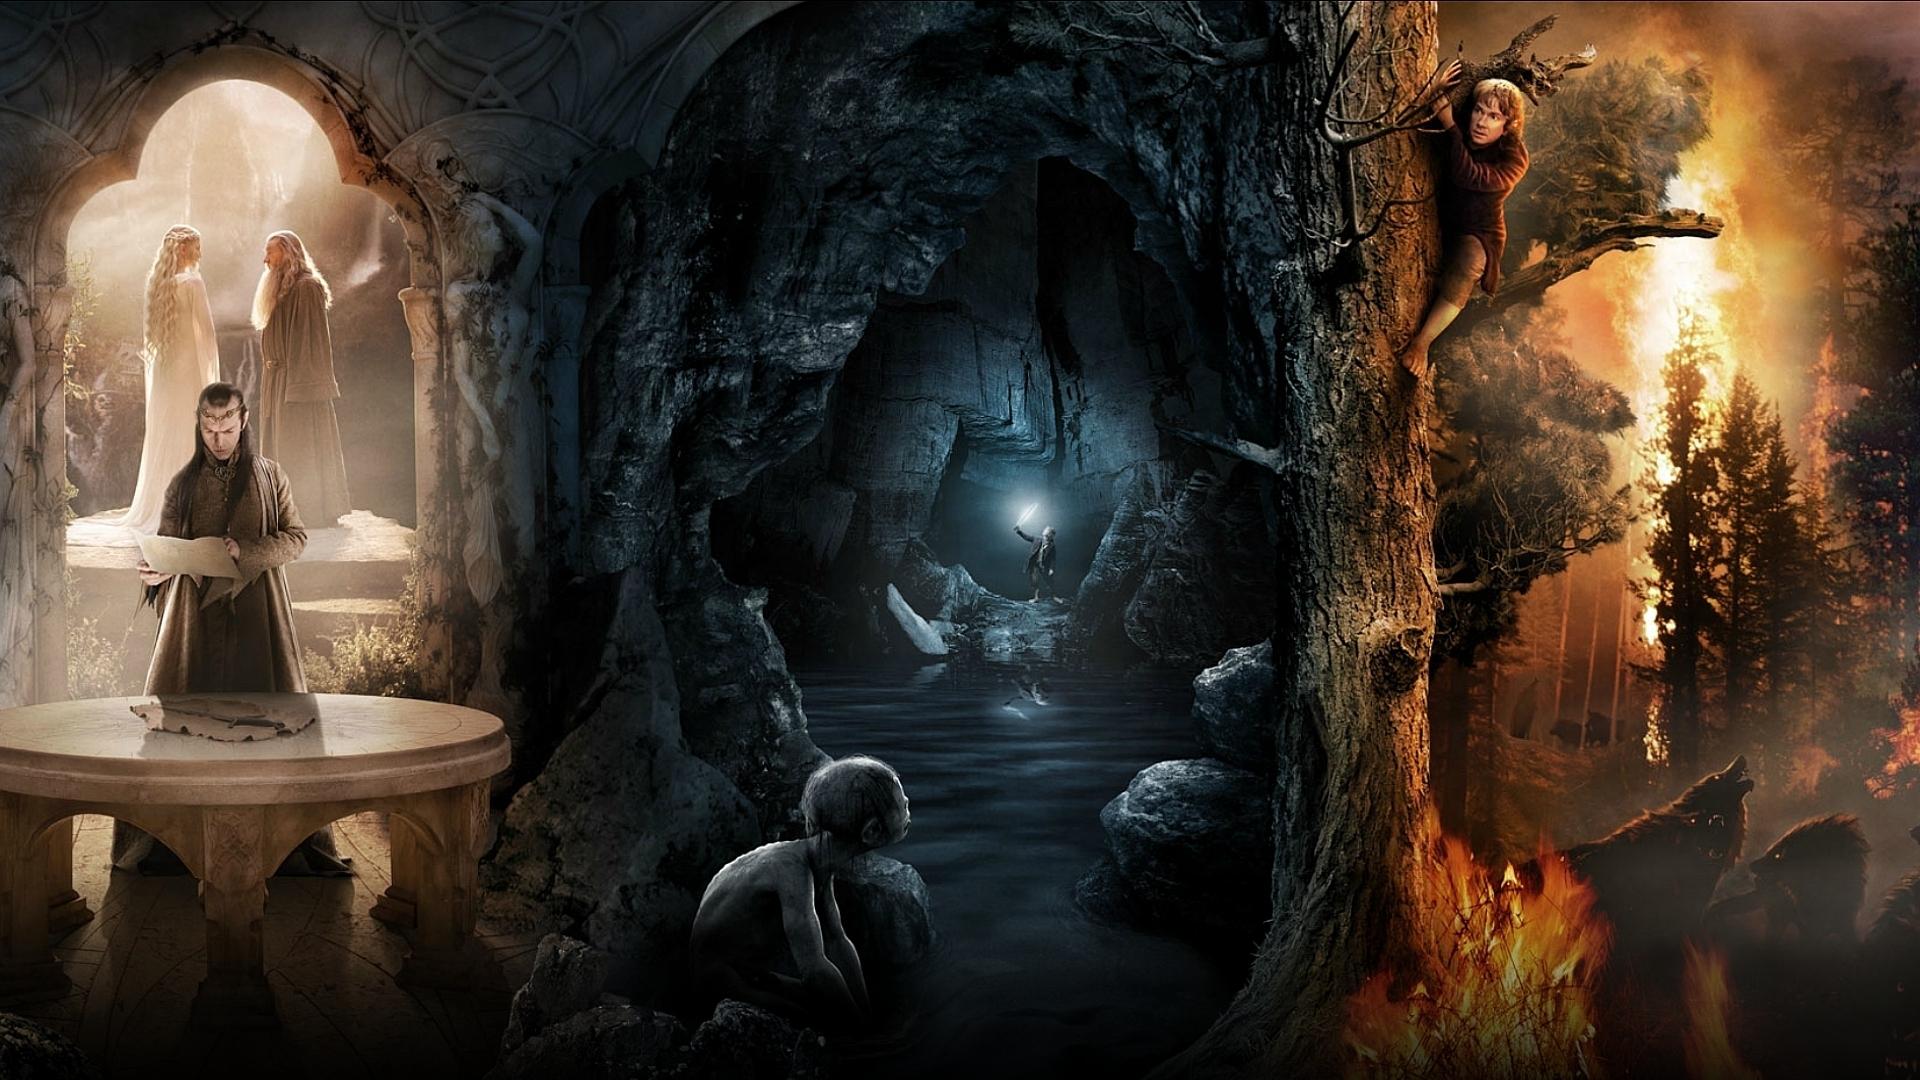 HD Wallpaper - Gollum - Bäume, Wald, Gandalf, Feuer, Elfen, Collage ...